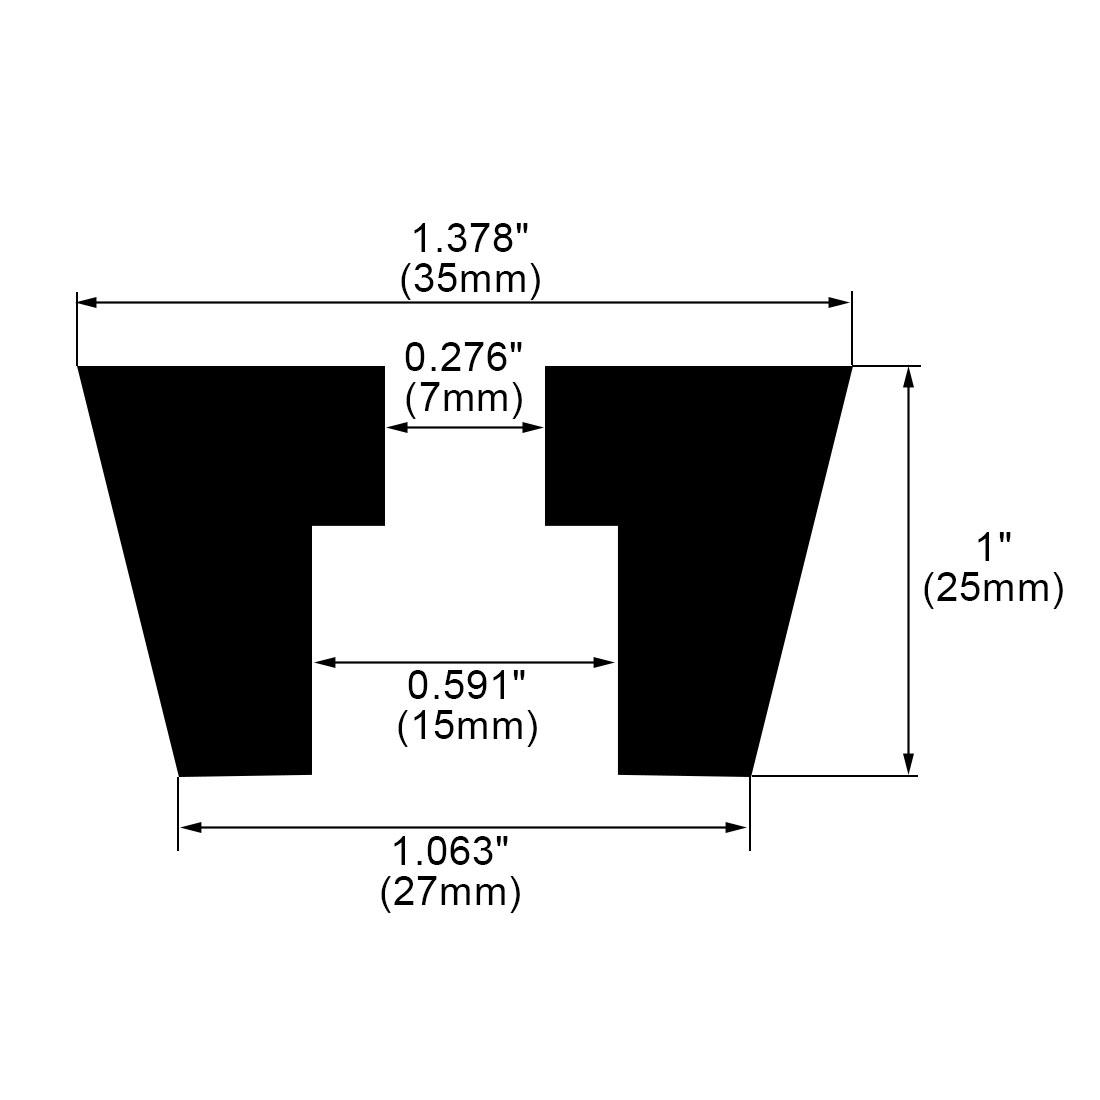 14pcs Rubber Feet Bumper Furniture Table Leg Pads Floor Protector, D35x27x25mm - image 1 of 7